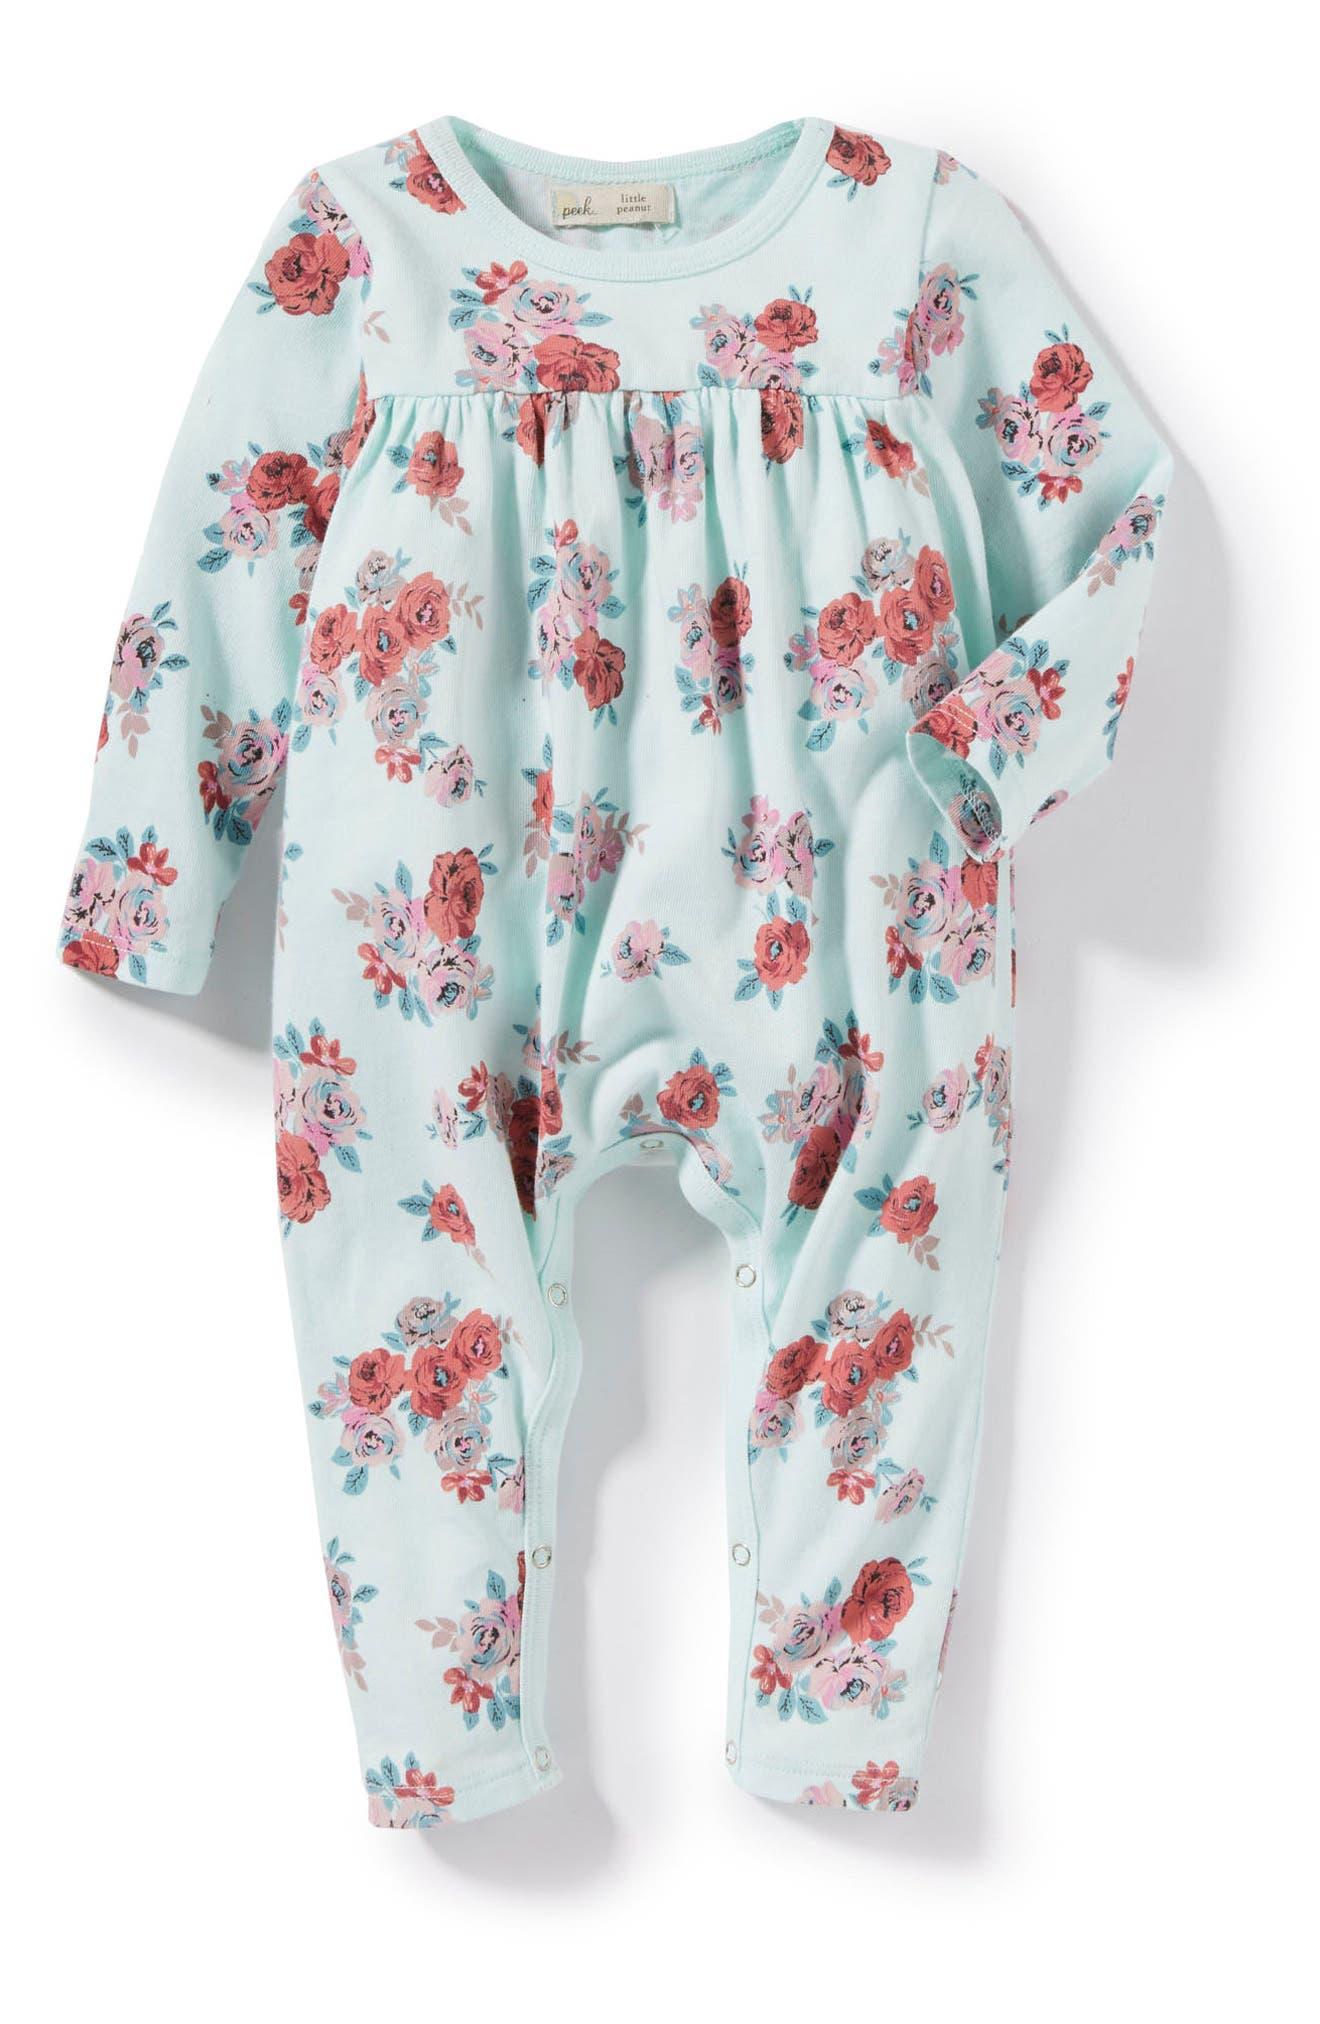 Main Image - Peek Floral Romper (Baby Girls)